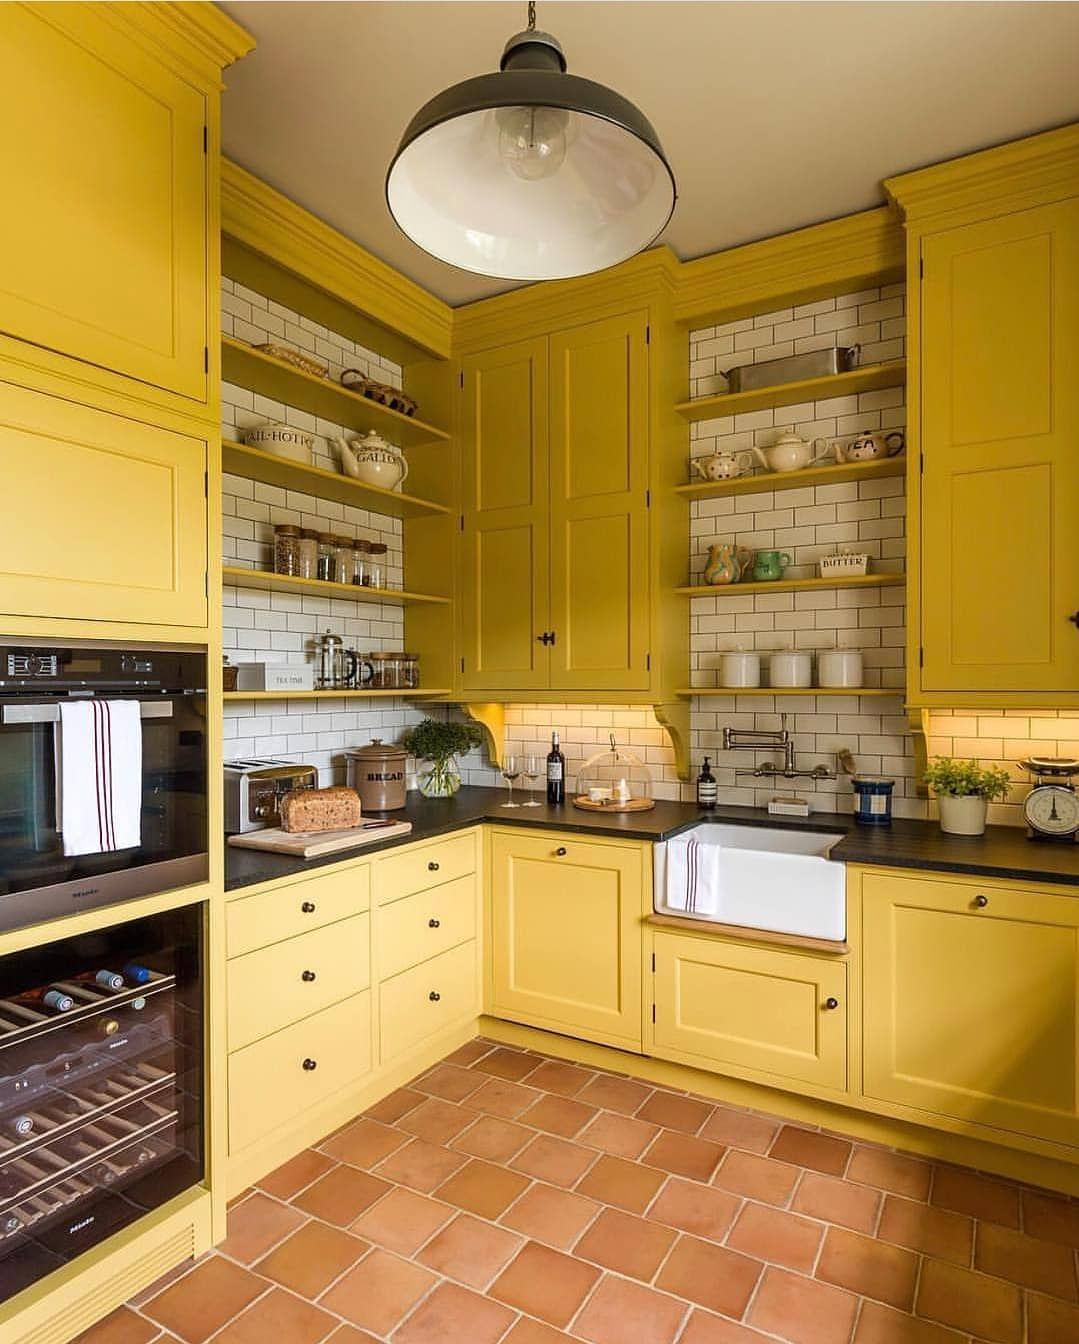 9 Glomorous Yellow Kitchen Design Ideas   Yellow kitchen cabinets ...